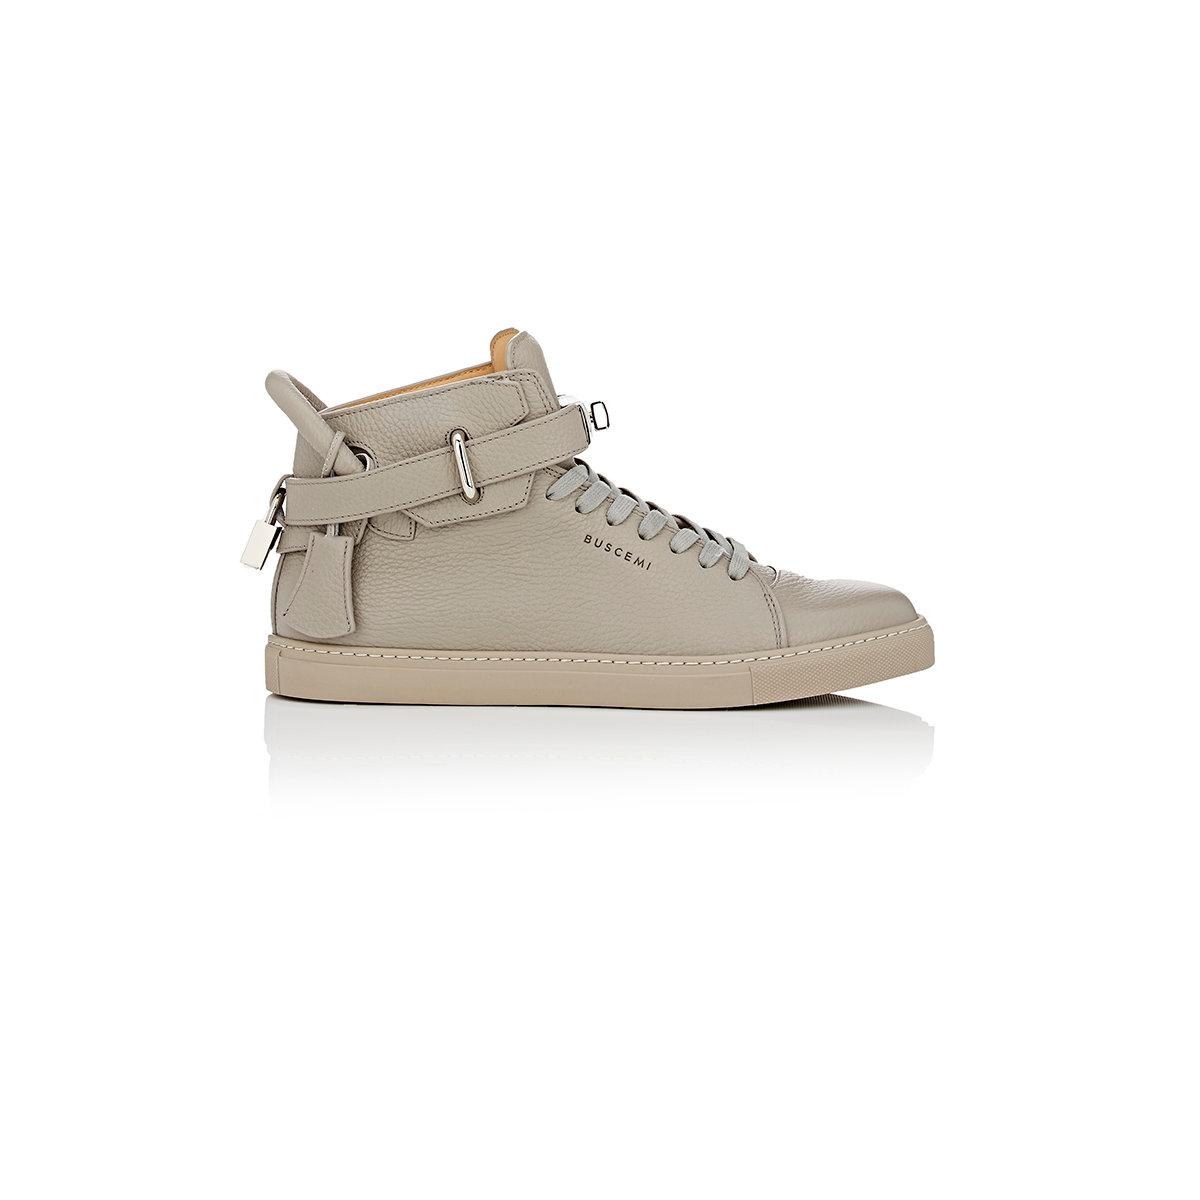 Buscemi Shoes Uk